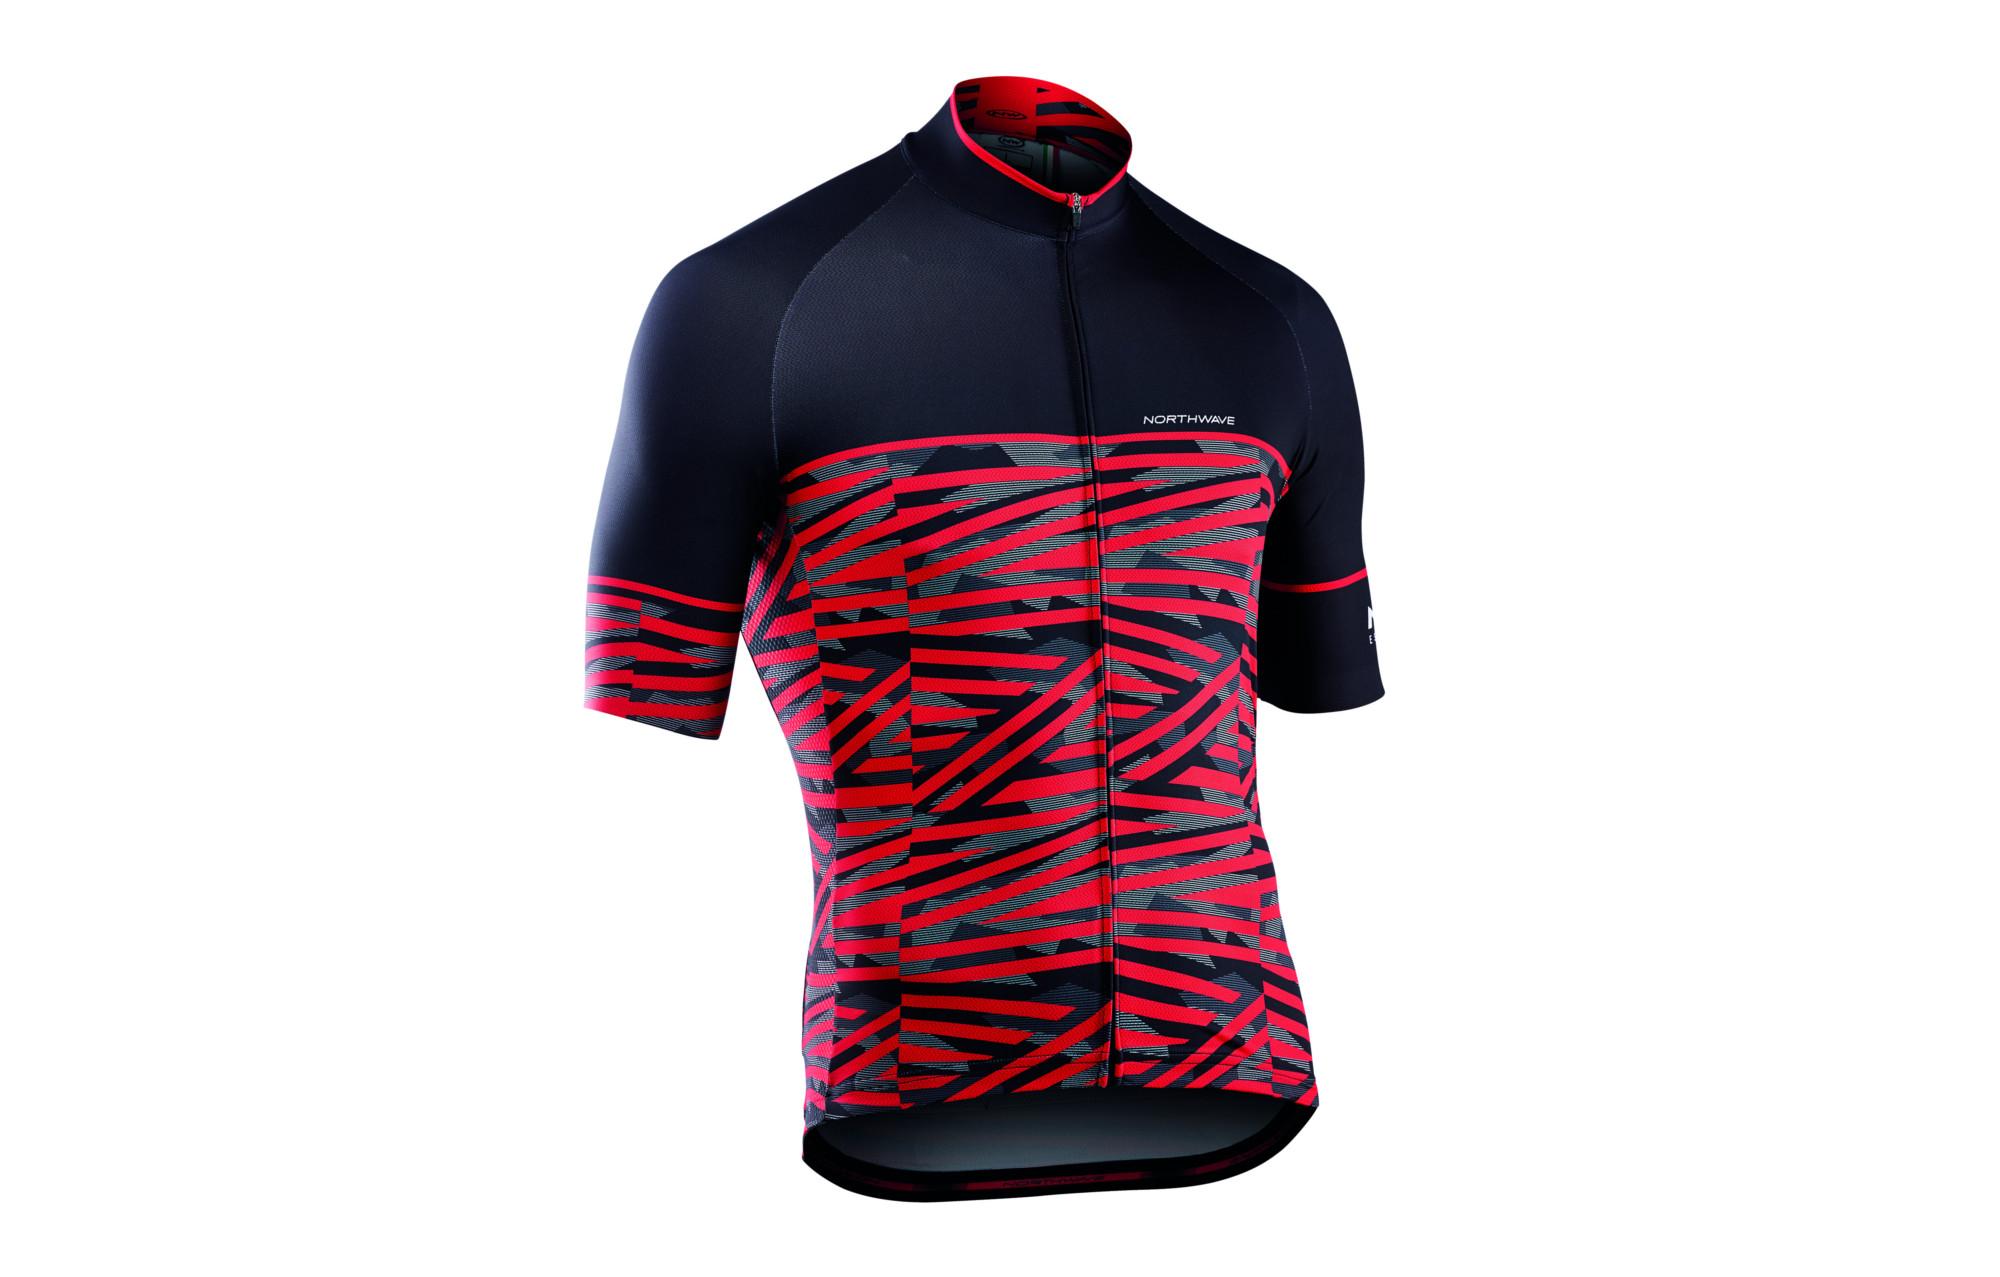 maillot manches courtes northwave point break rouge noir 2017. Black Bedroom Furniture Sets. Home Design Ideas